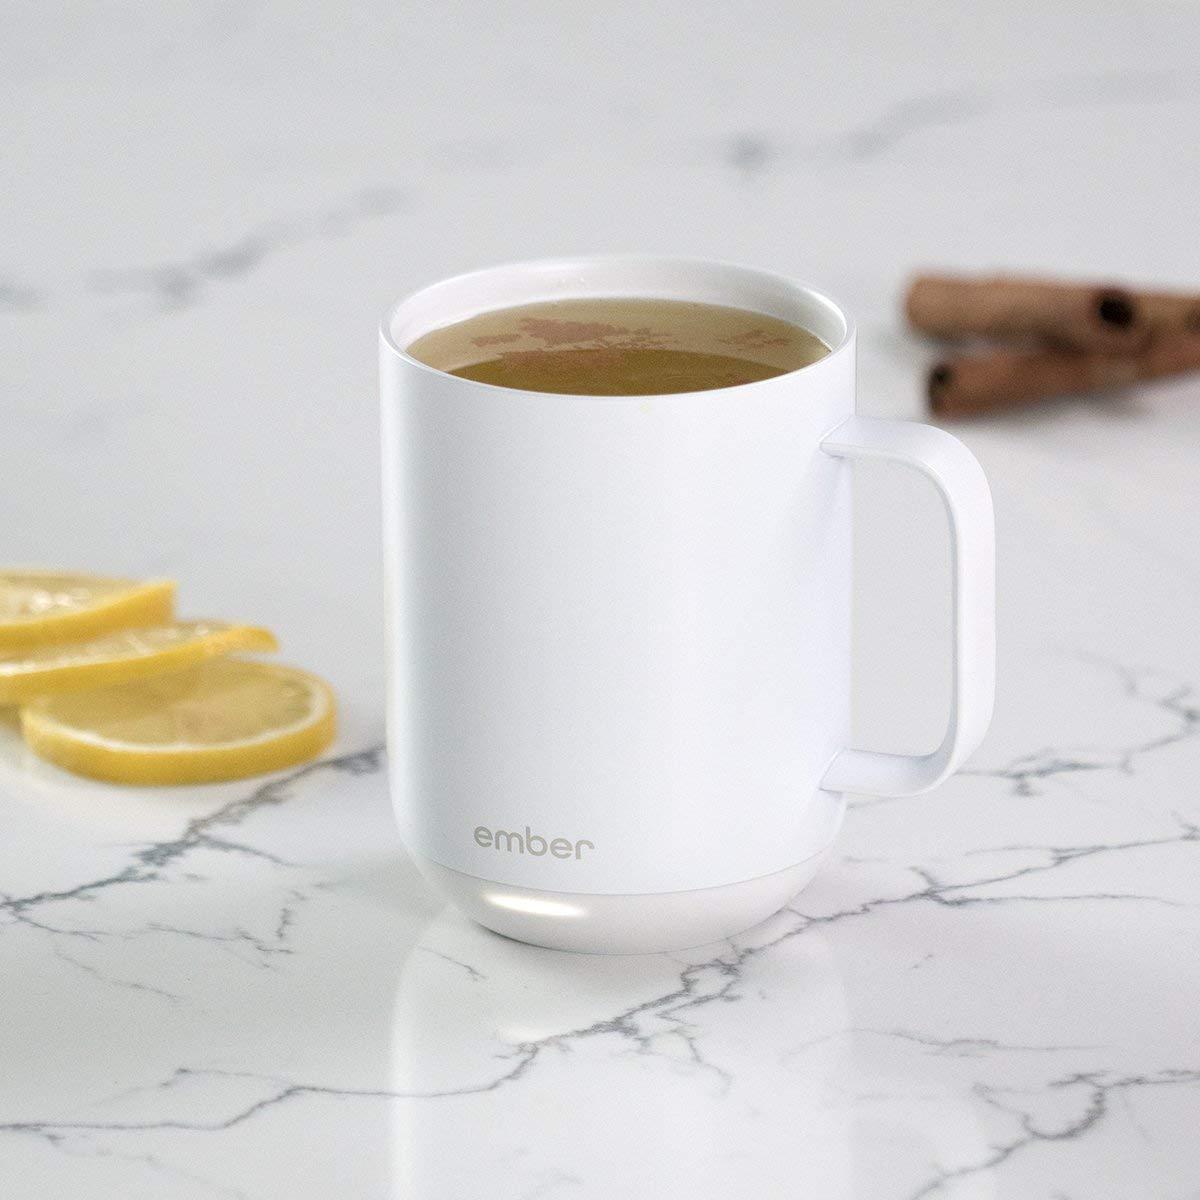 Ember: Temperature Control Ceramic Mug